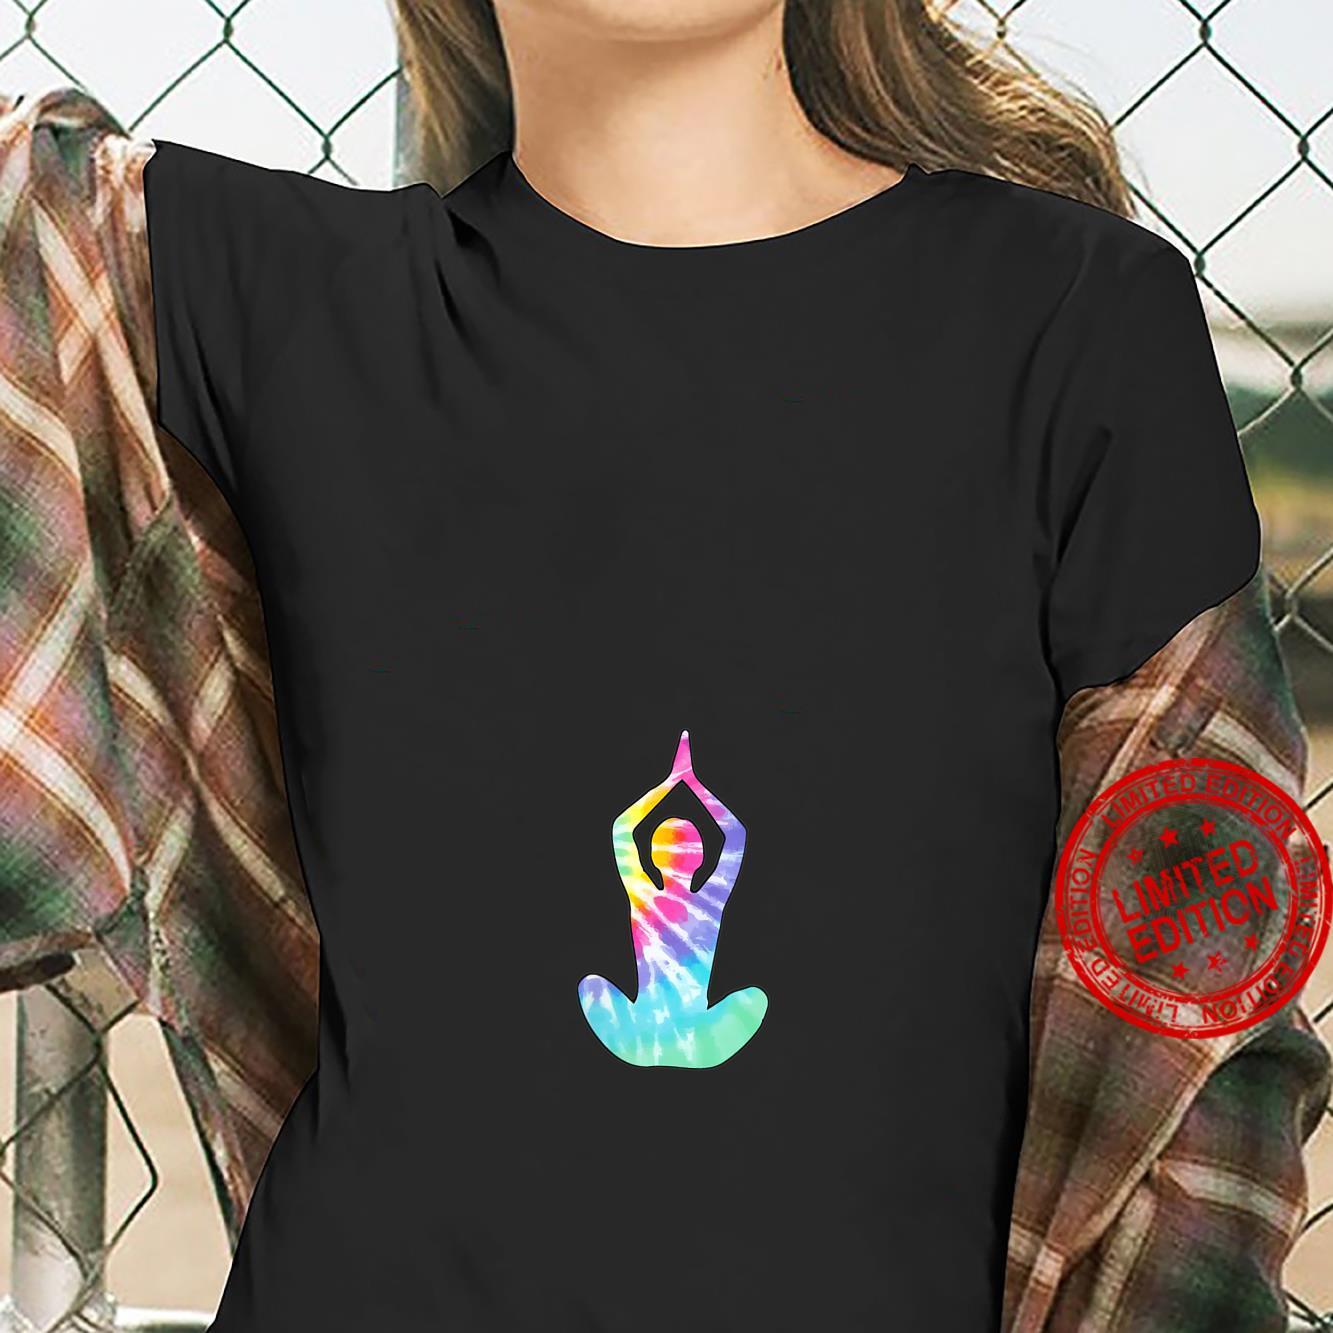 Womens Tie Dye Yoga Sitting Pose Shirt ladies tee